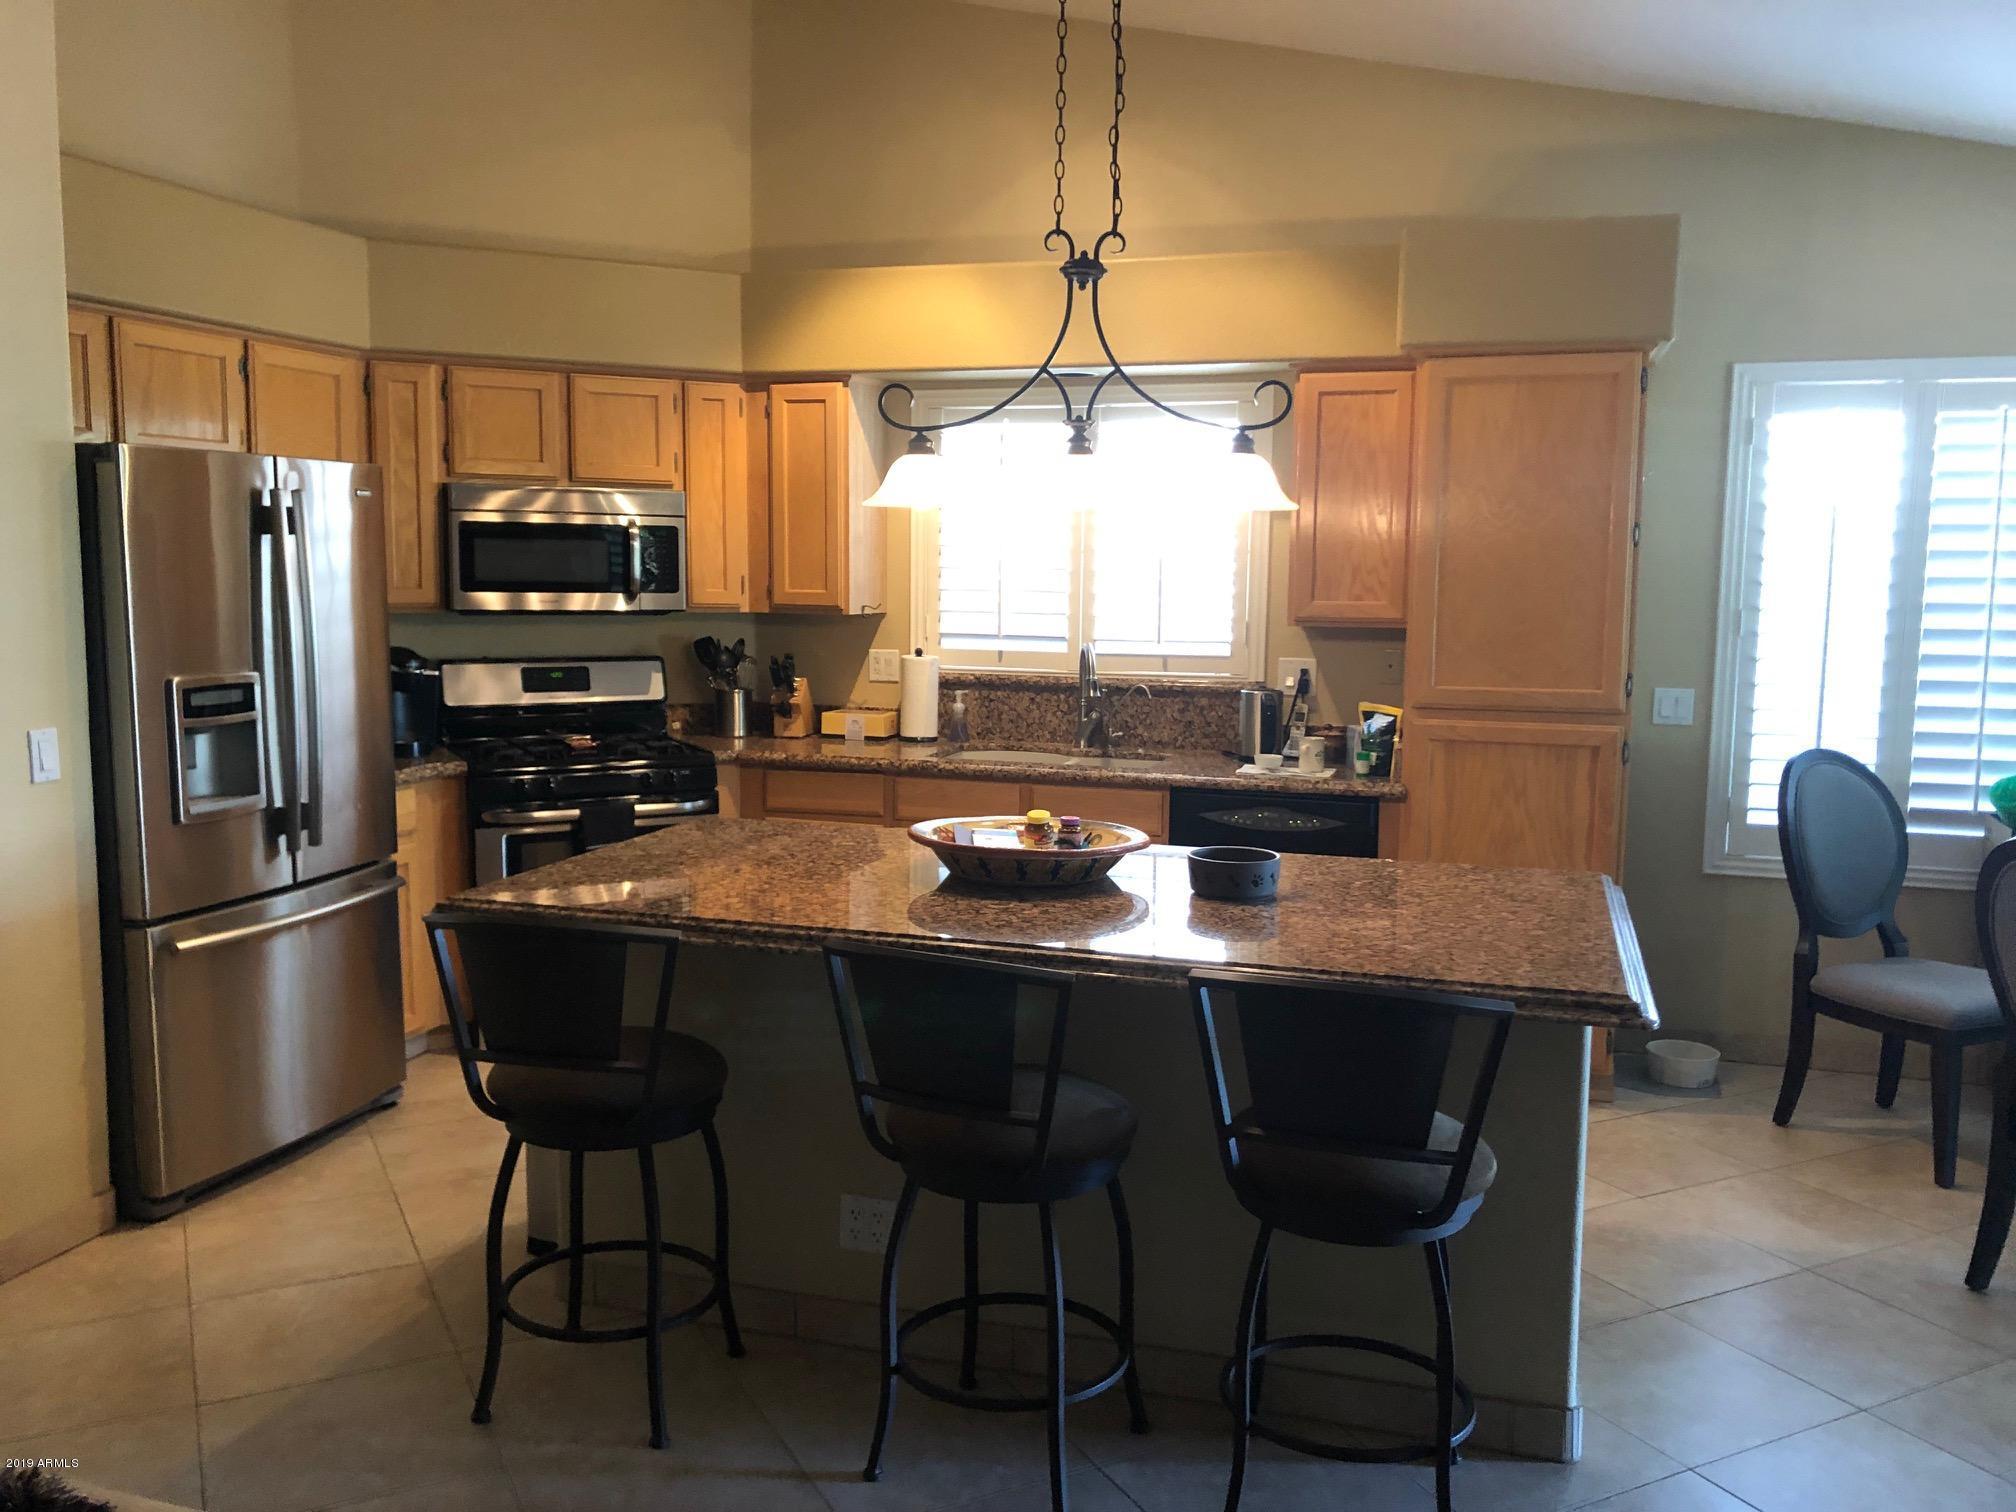 MLS 5914221 10947 W YUKON Drive, Sun City, AZ 85373 Sun City Homes for Rent